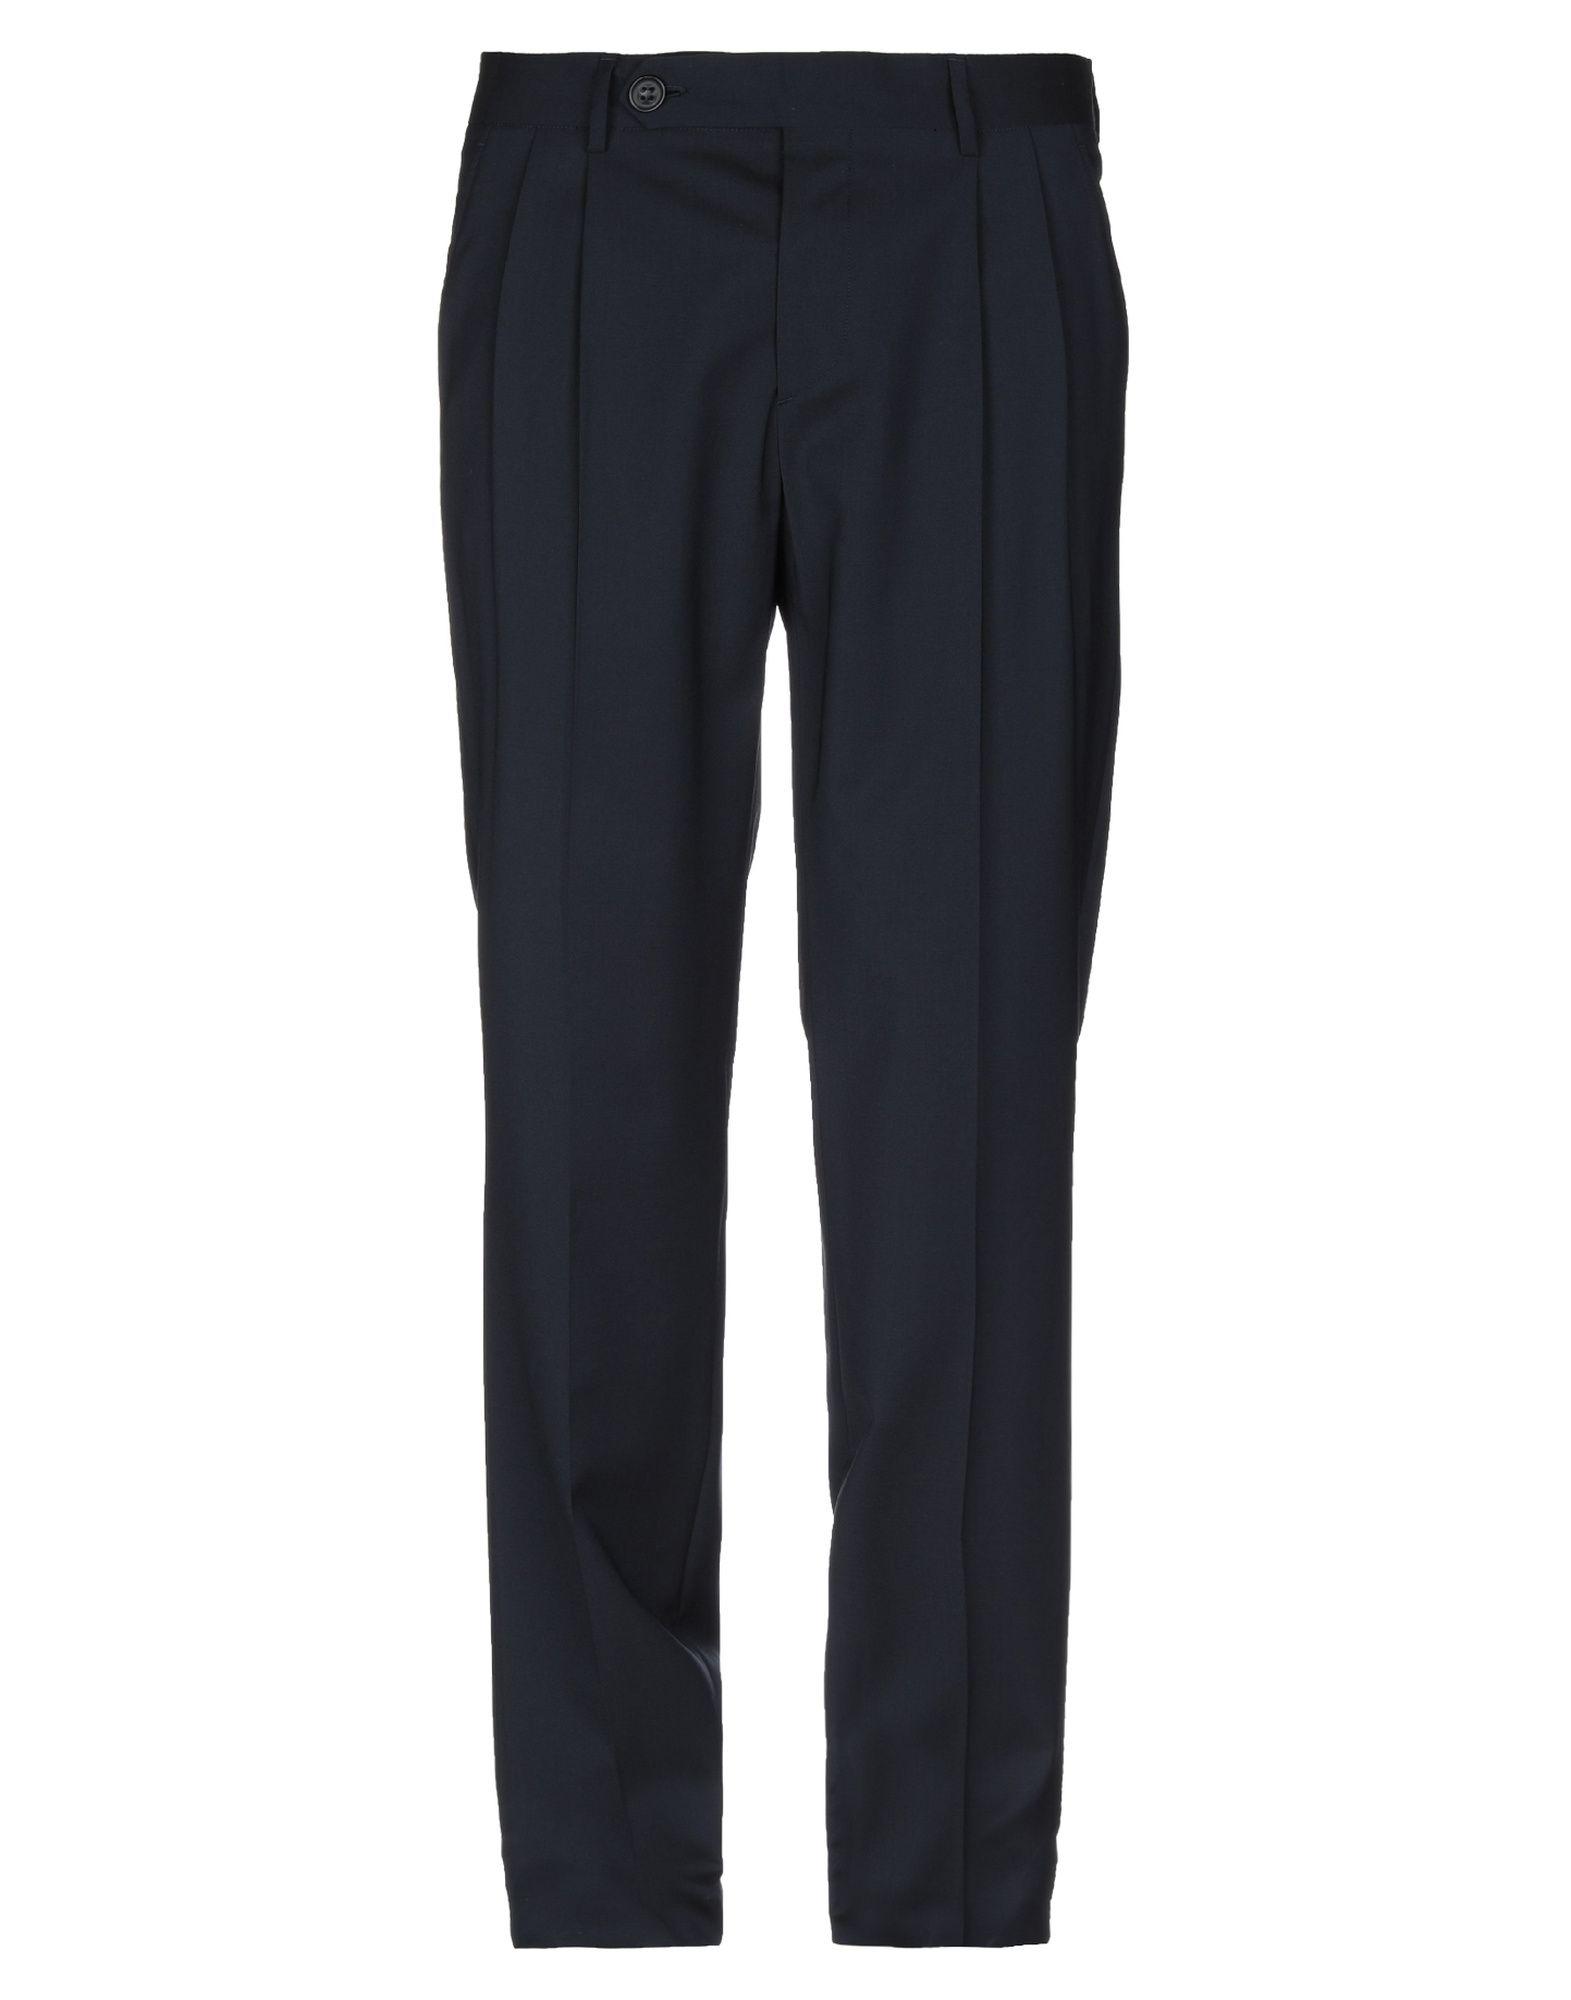 Pantalone Aglini Aglini Aglini uomo - 13313037UG dc1